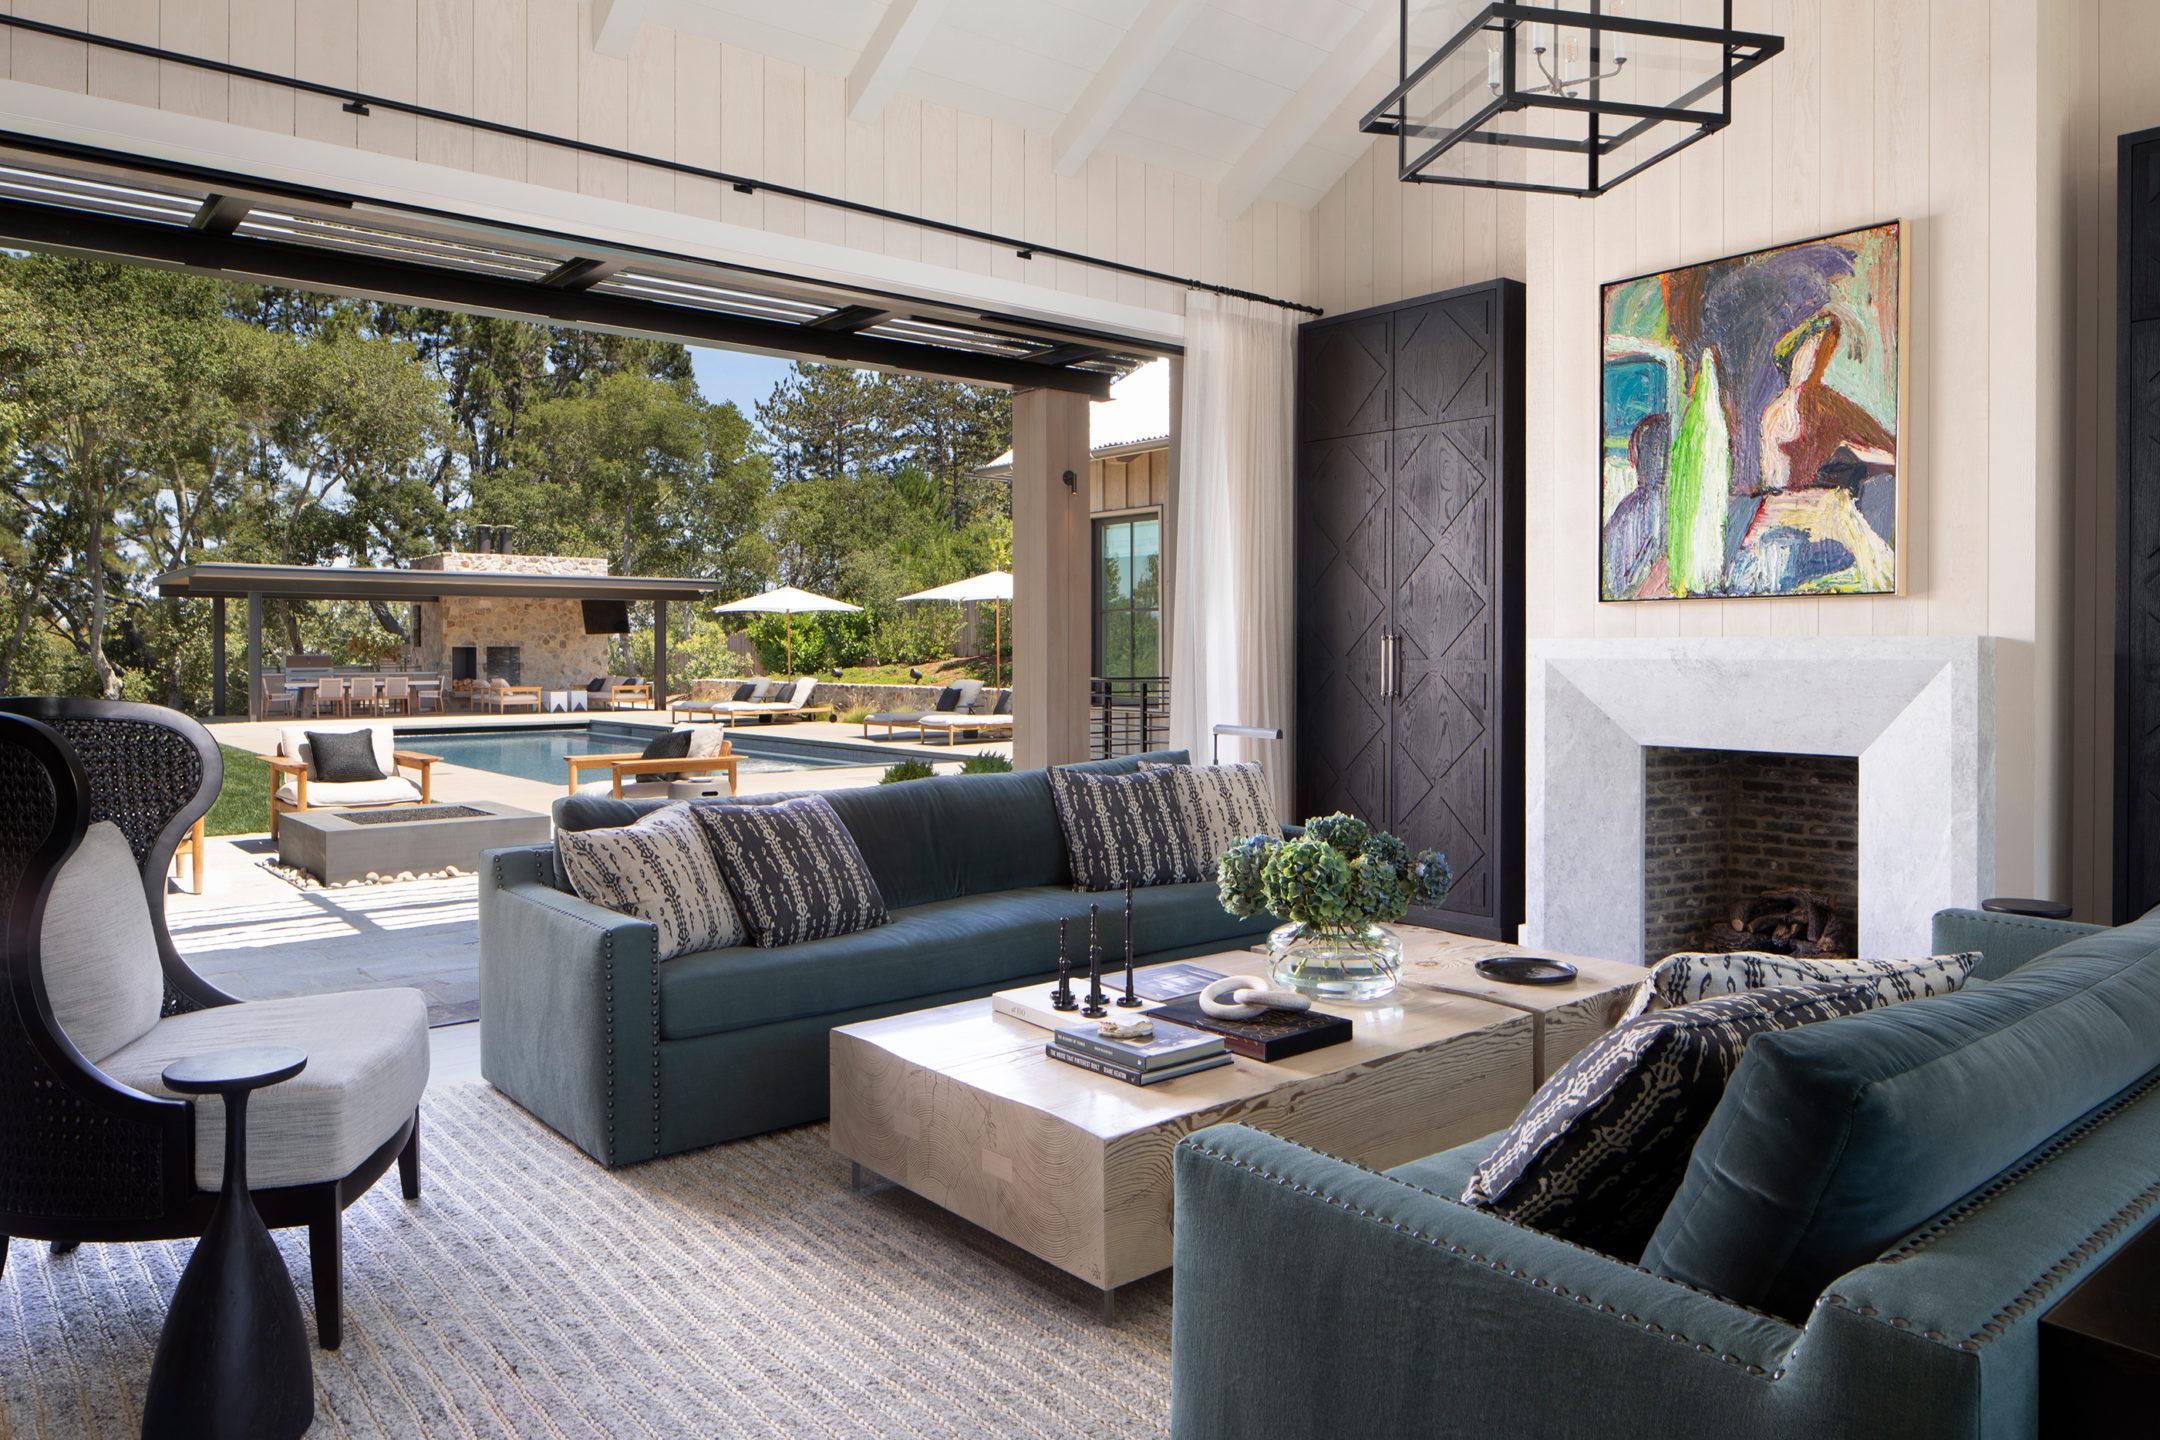 Jennifer_robins_interiors_projects_pacific_heights_portola_valley_living_room_interior_int_exterior_ext9Portola_14_HR